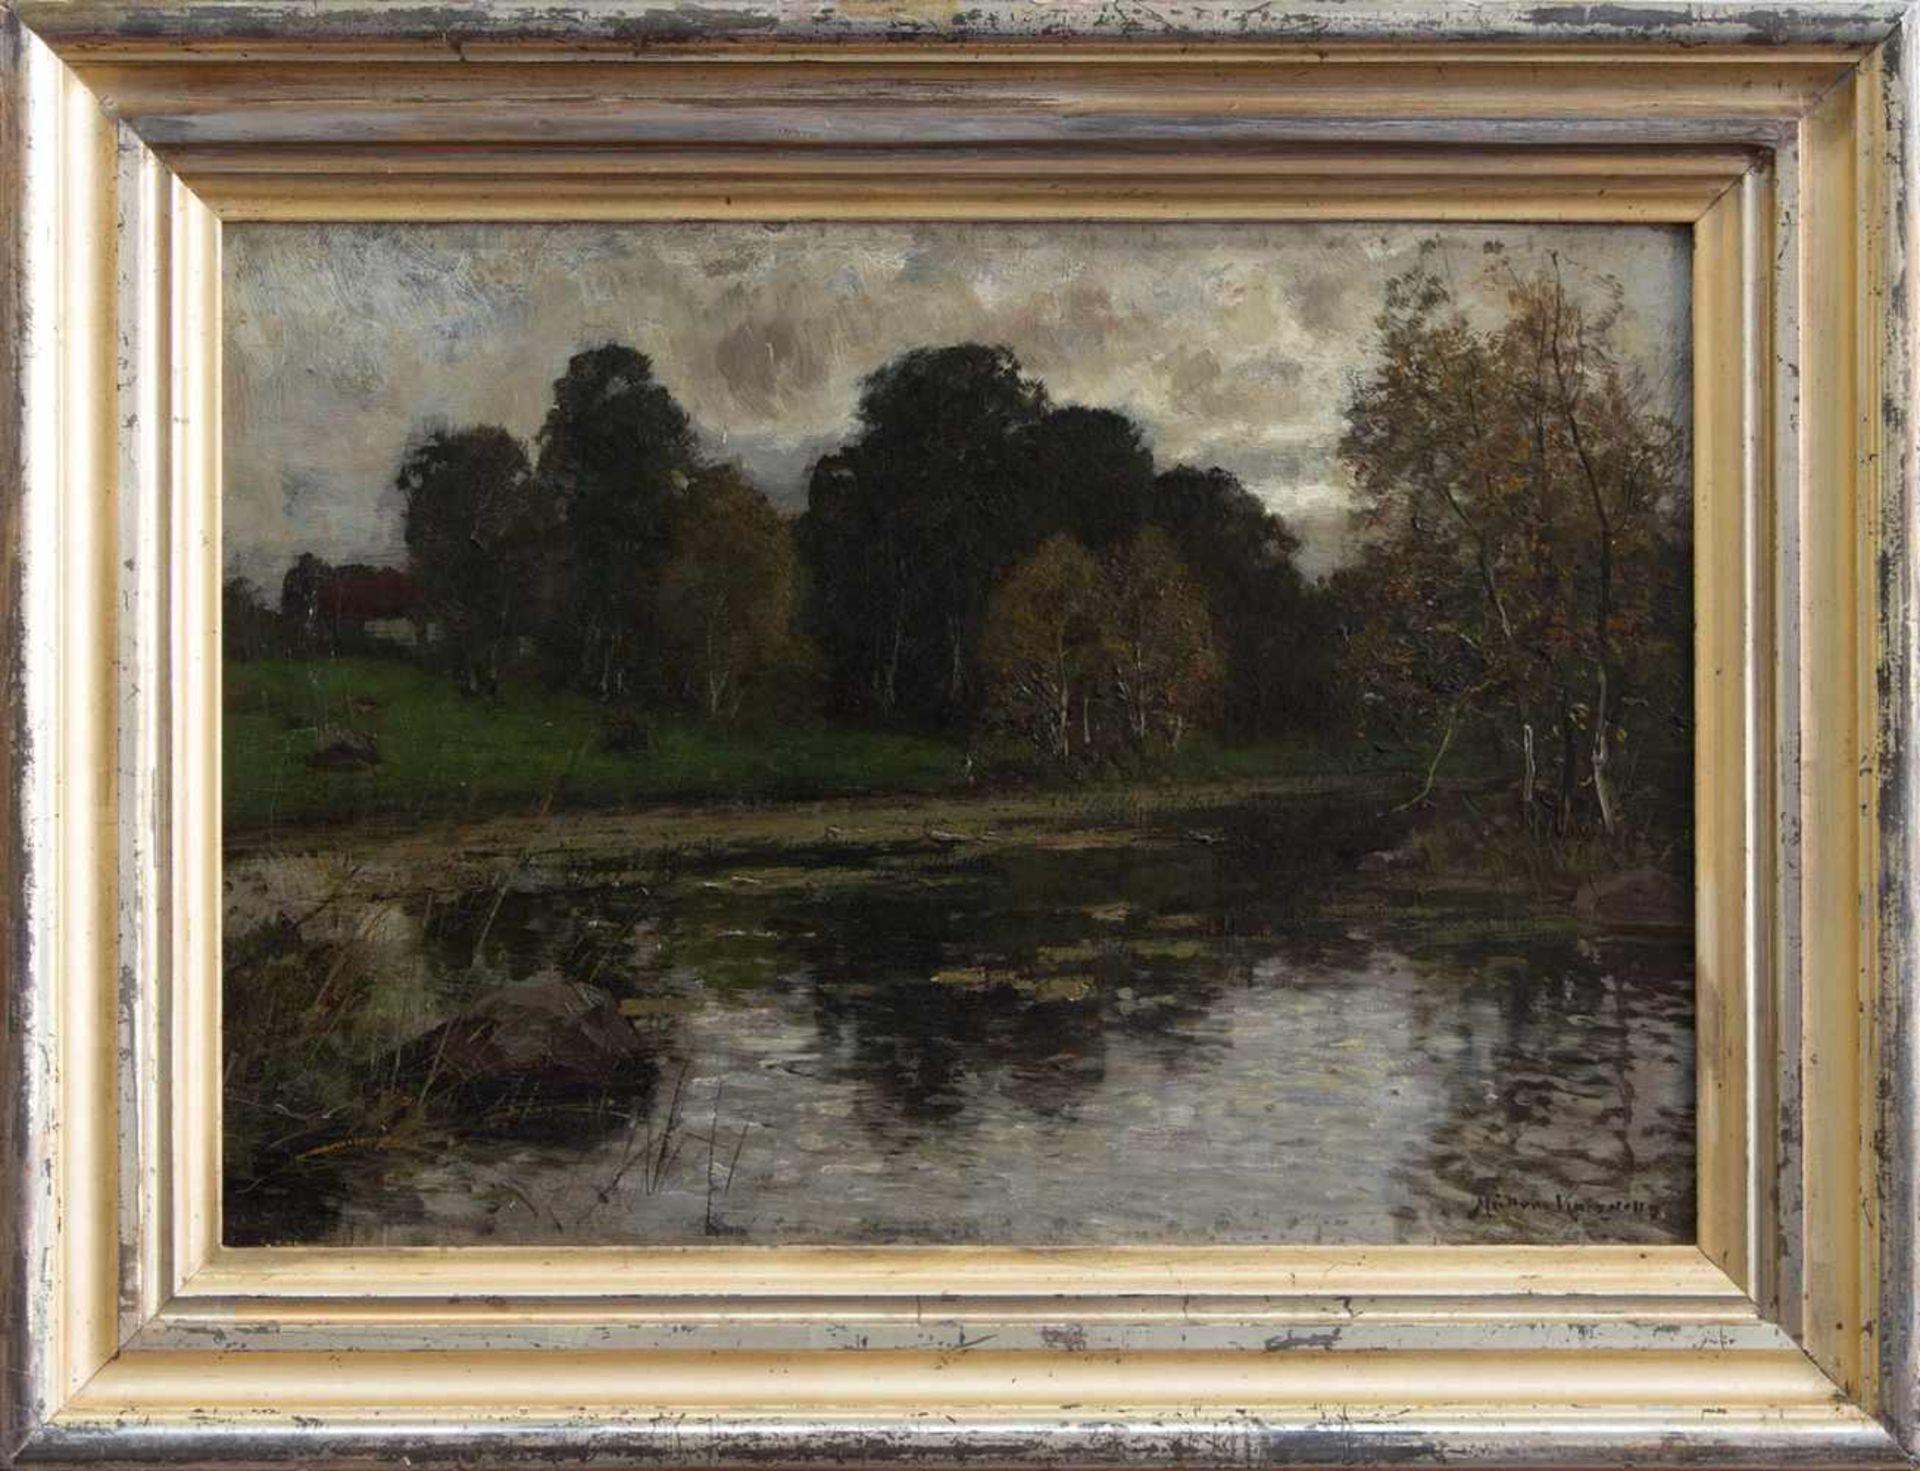 Konrad Müller-Kurzwelly (Chemnitz 1855 - 1914 Berlin, deutscher Maler, Std. a.d. Berliner AK,